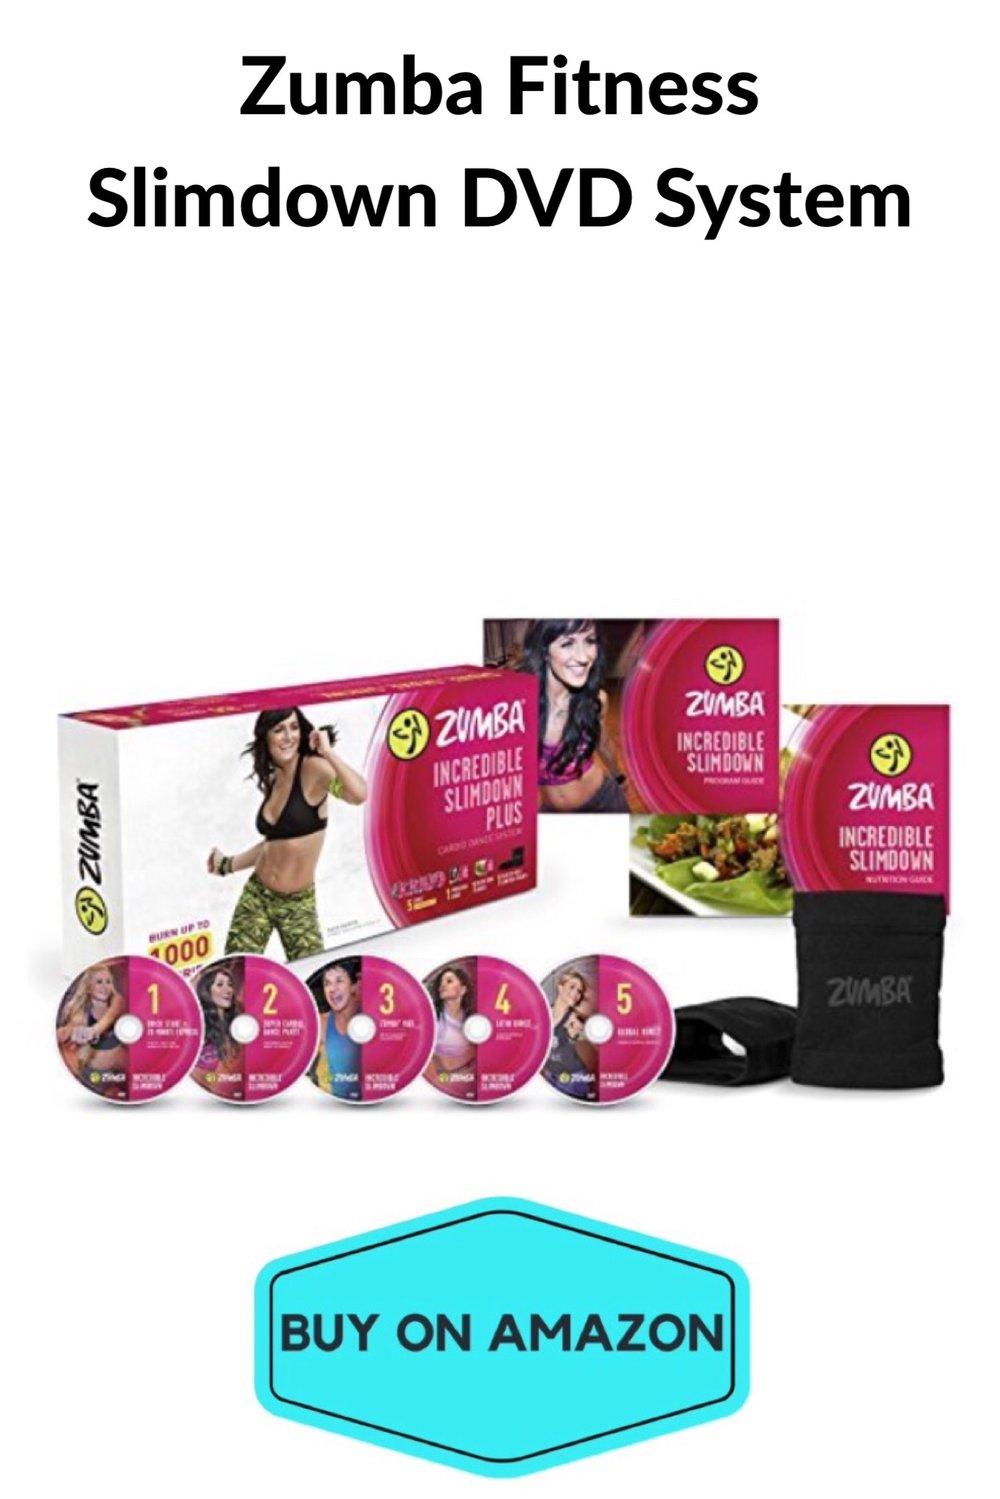 Zumba Fitness Slimdown DVD System